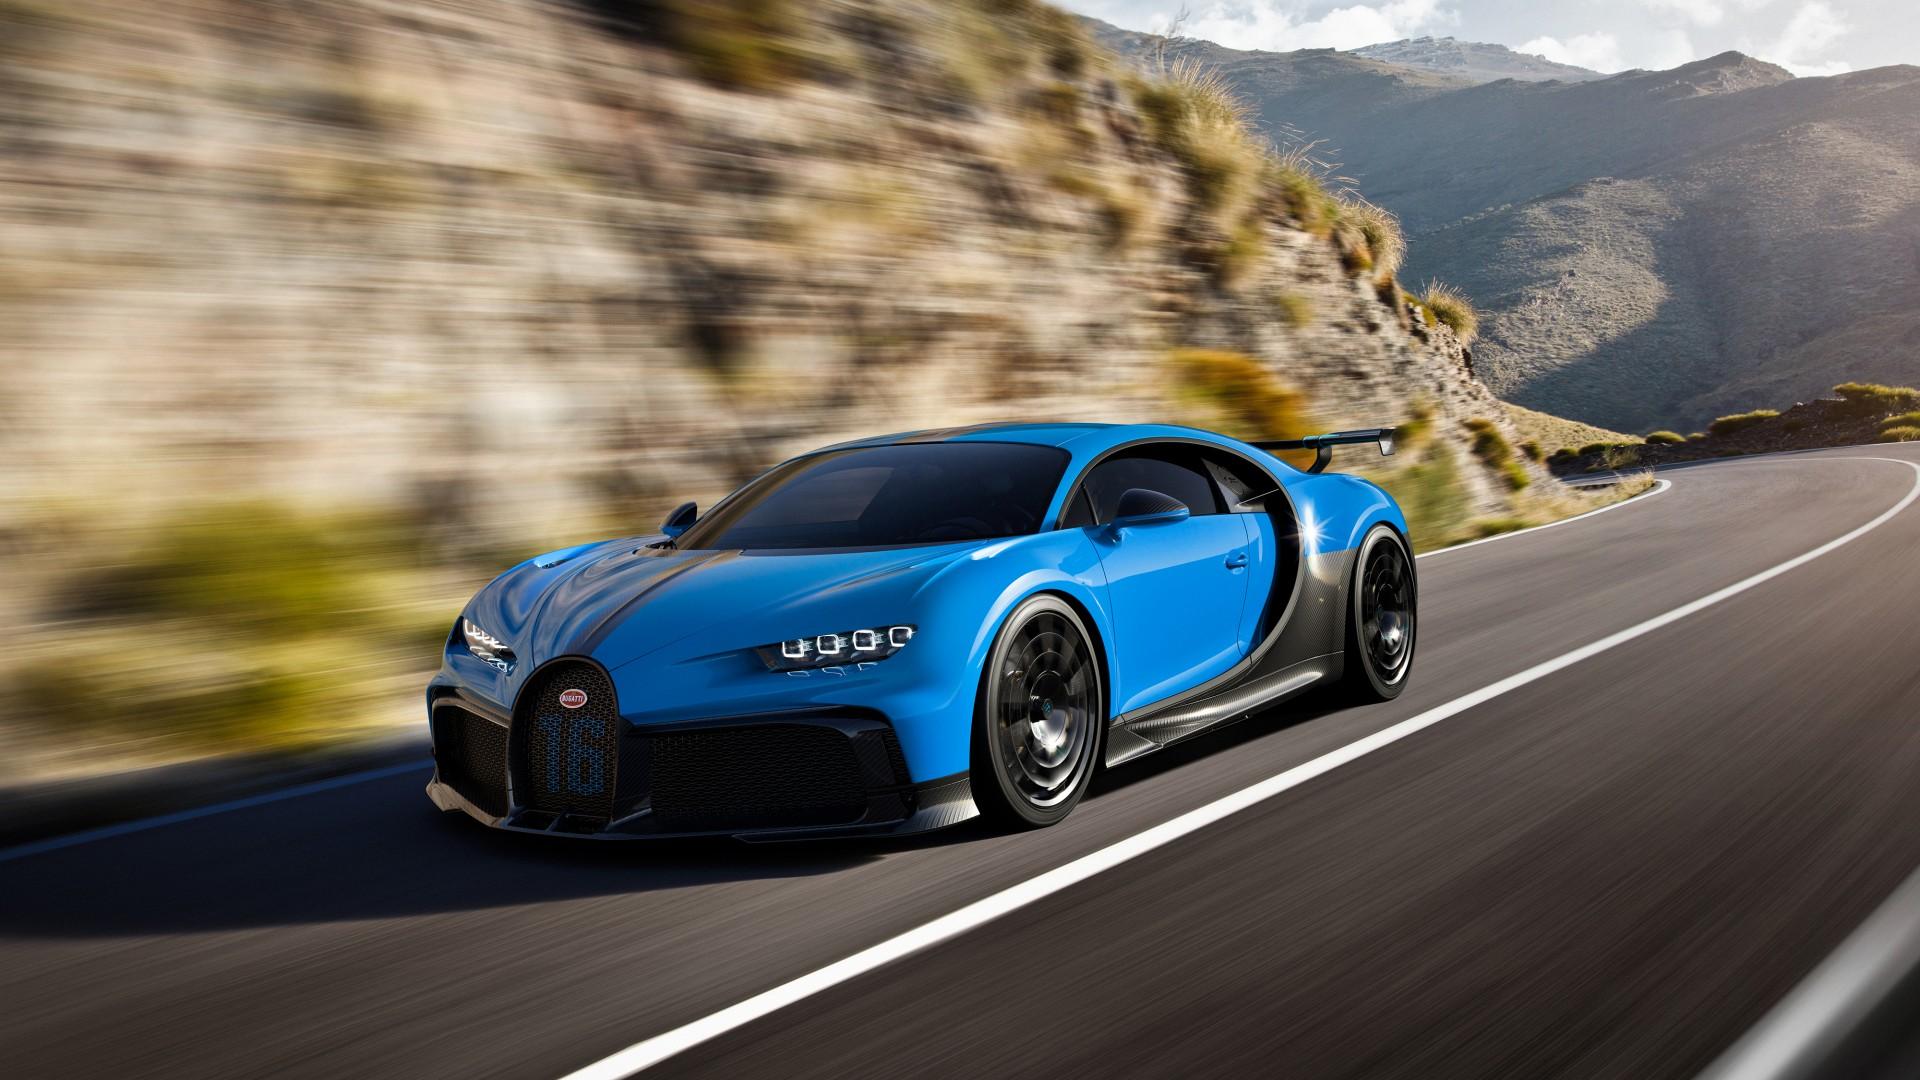 Bugatti Chiron Pur Sport 2020 4K Wallpaper   HD Car ...